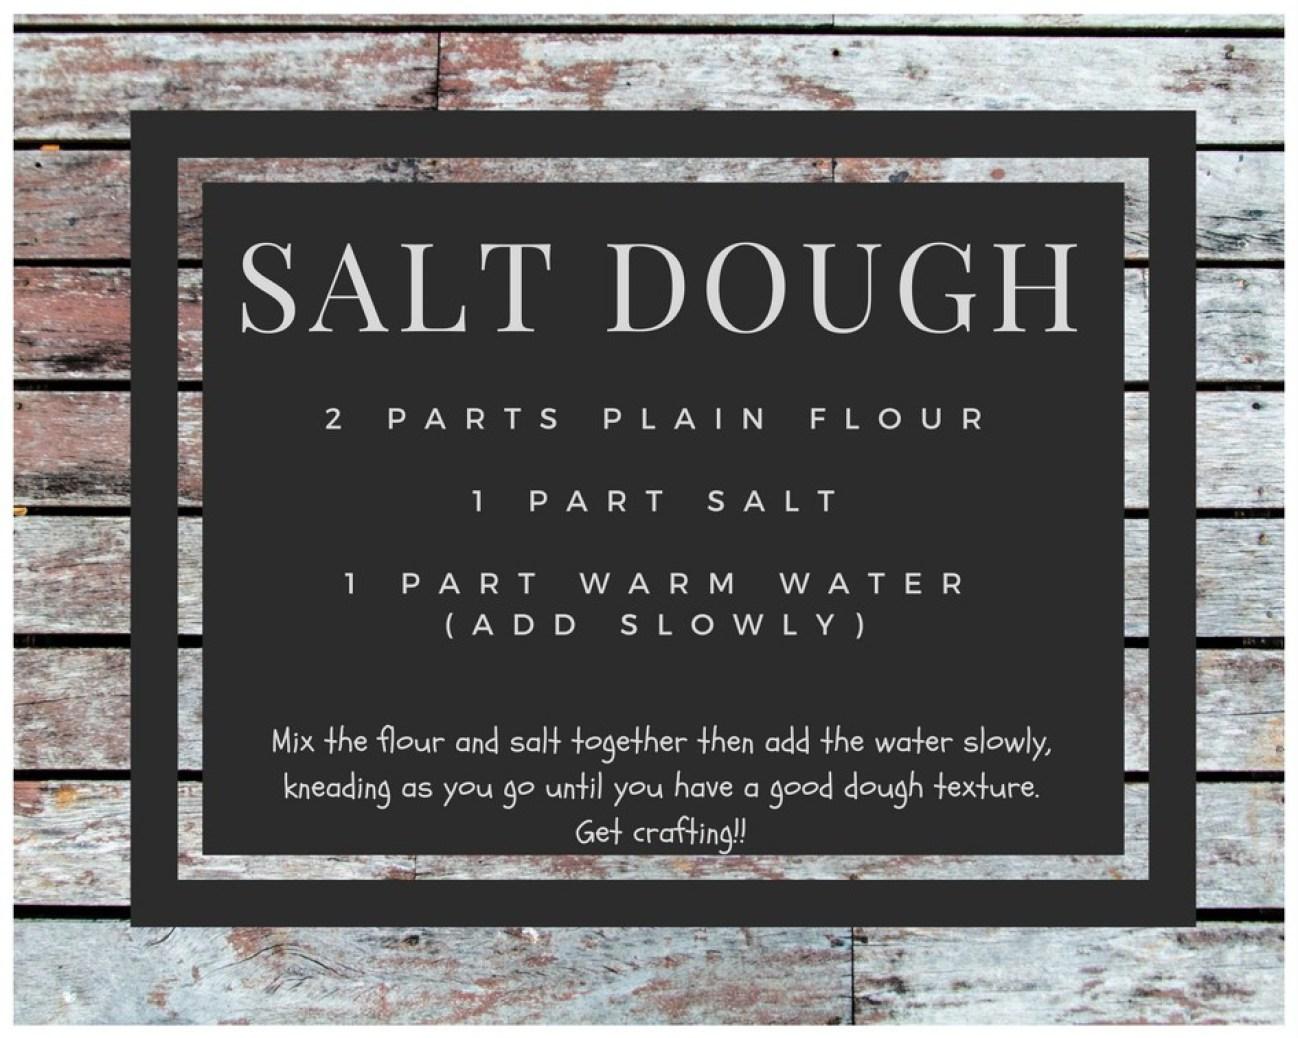 Make Your Own Dinosaur Fossils - salt dough recipe